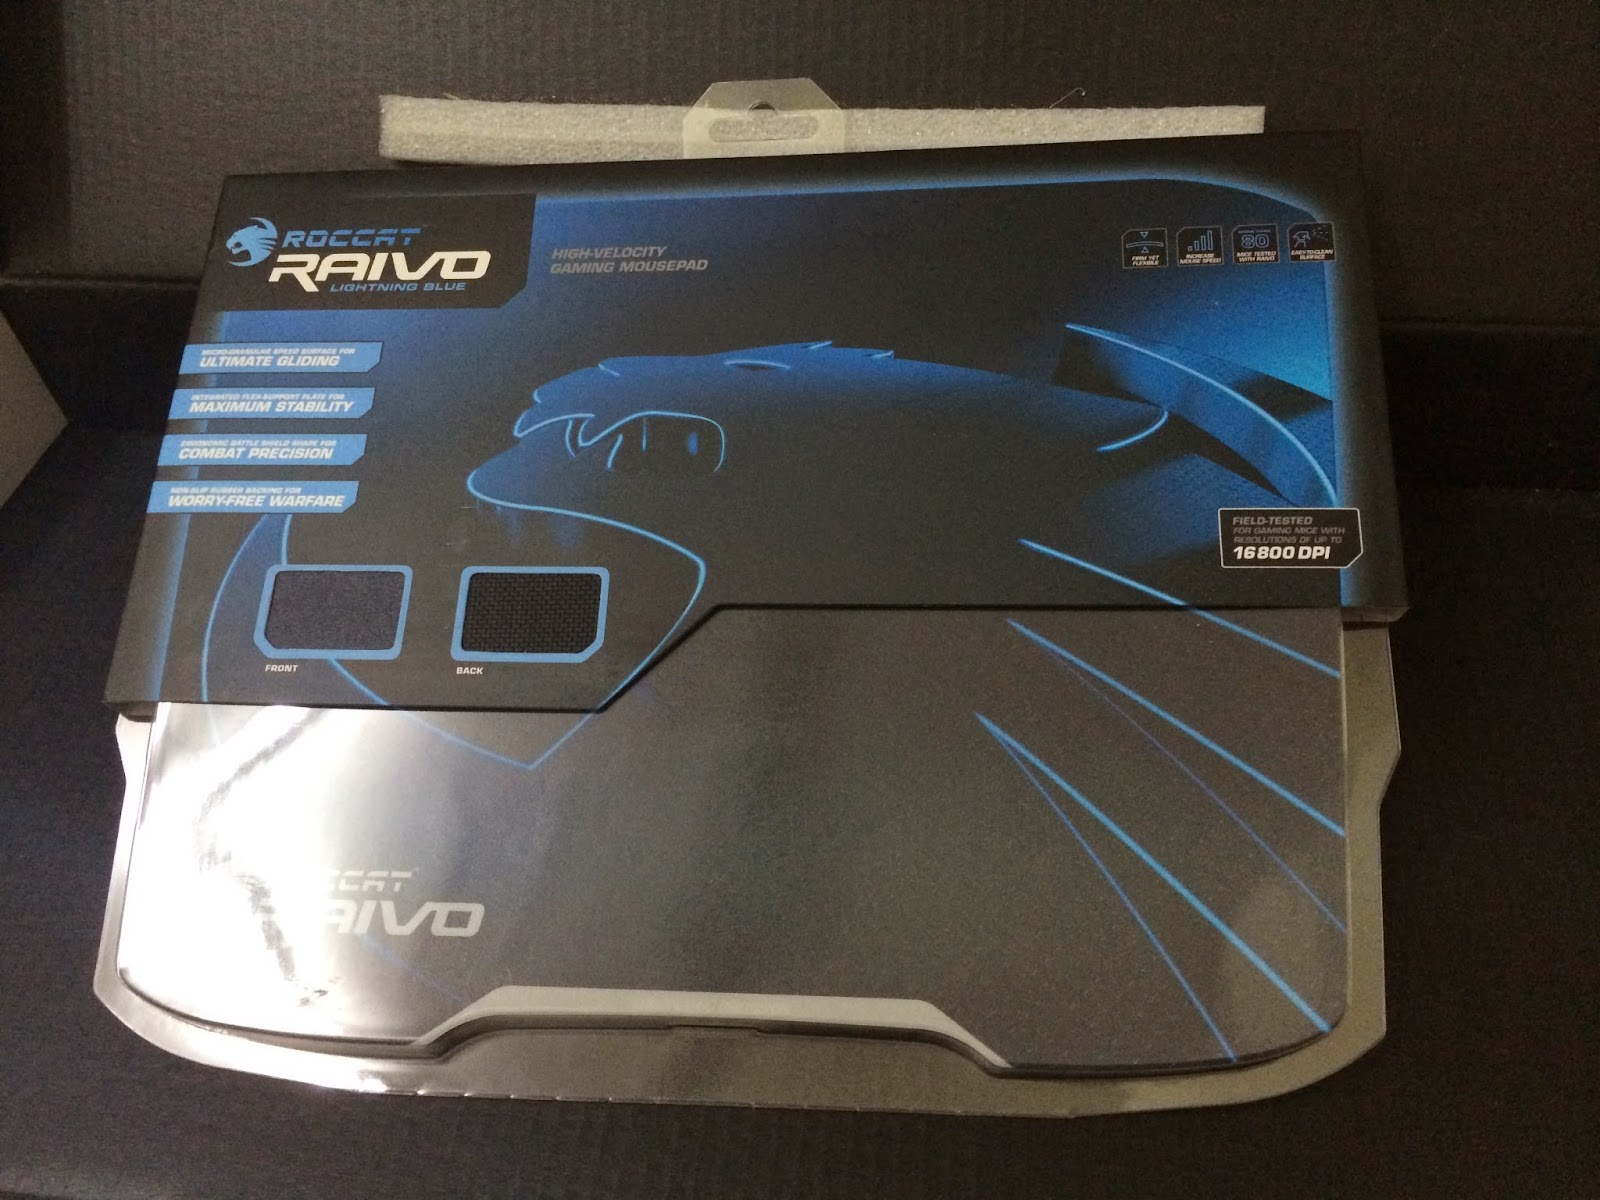 Unboxing & Review - ROCCAT RAIVO 27